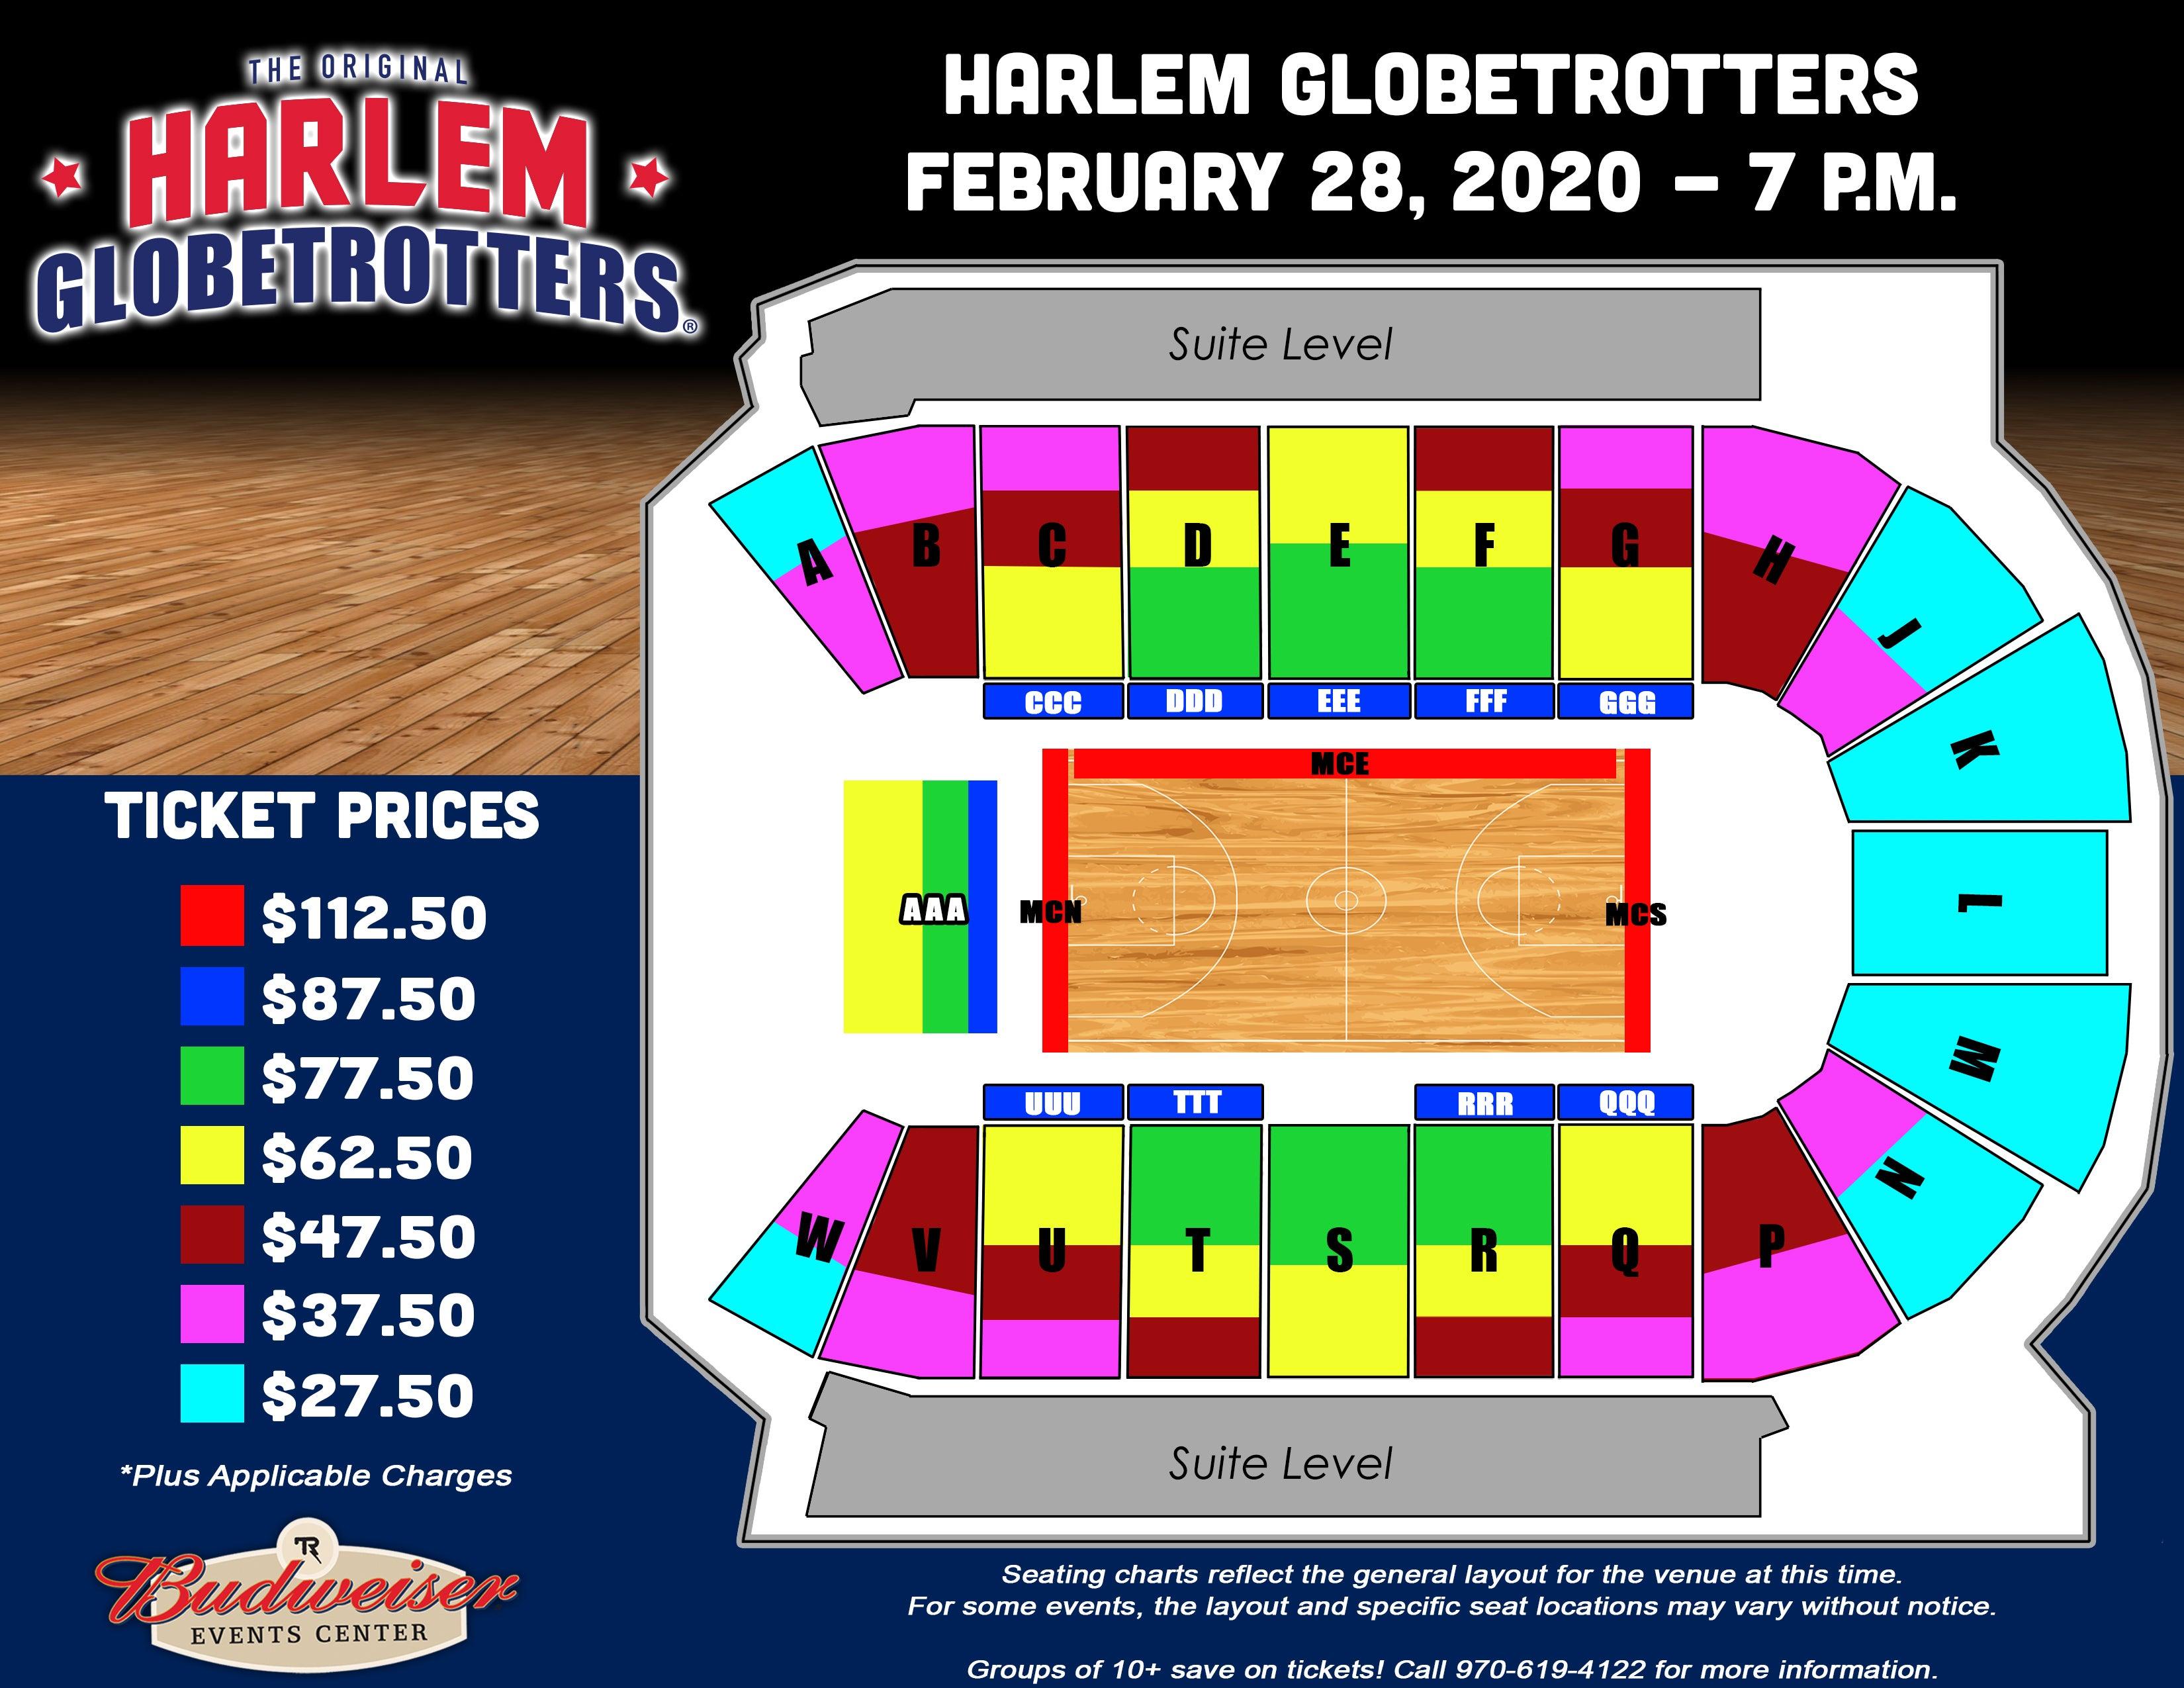 Harlem Globetrotters - Seating Map